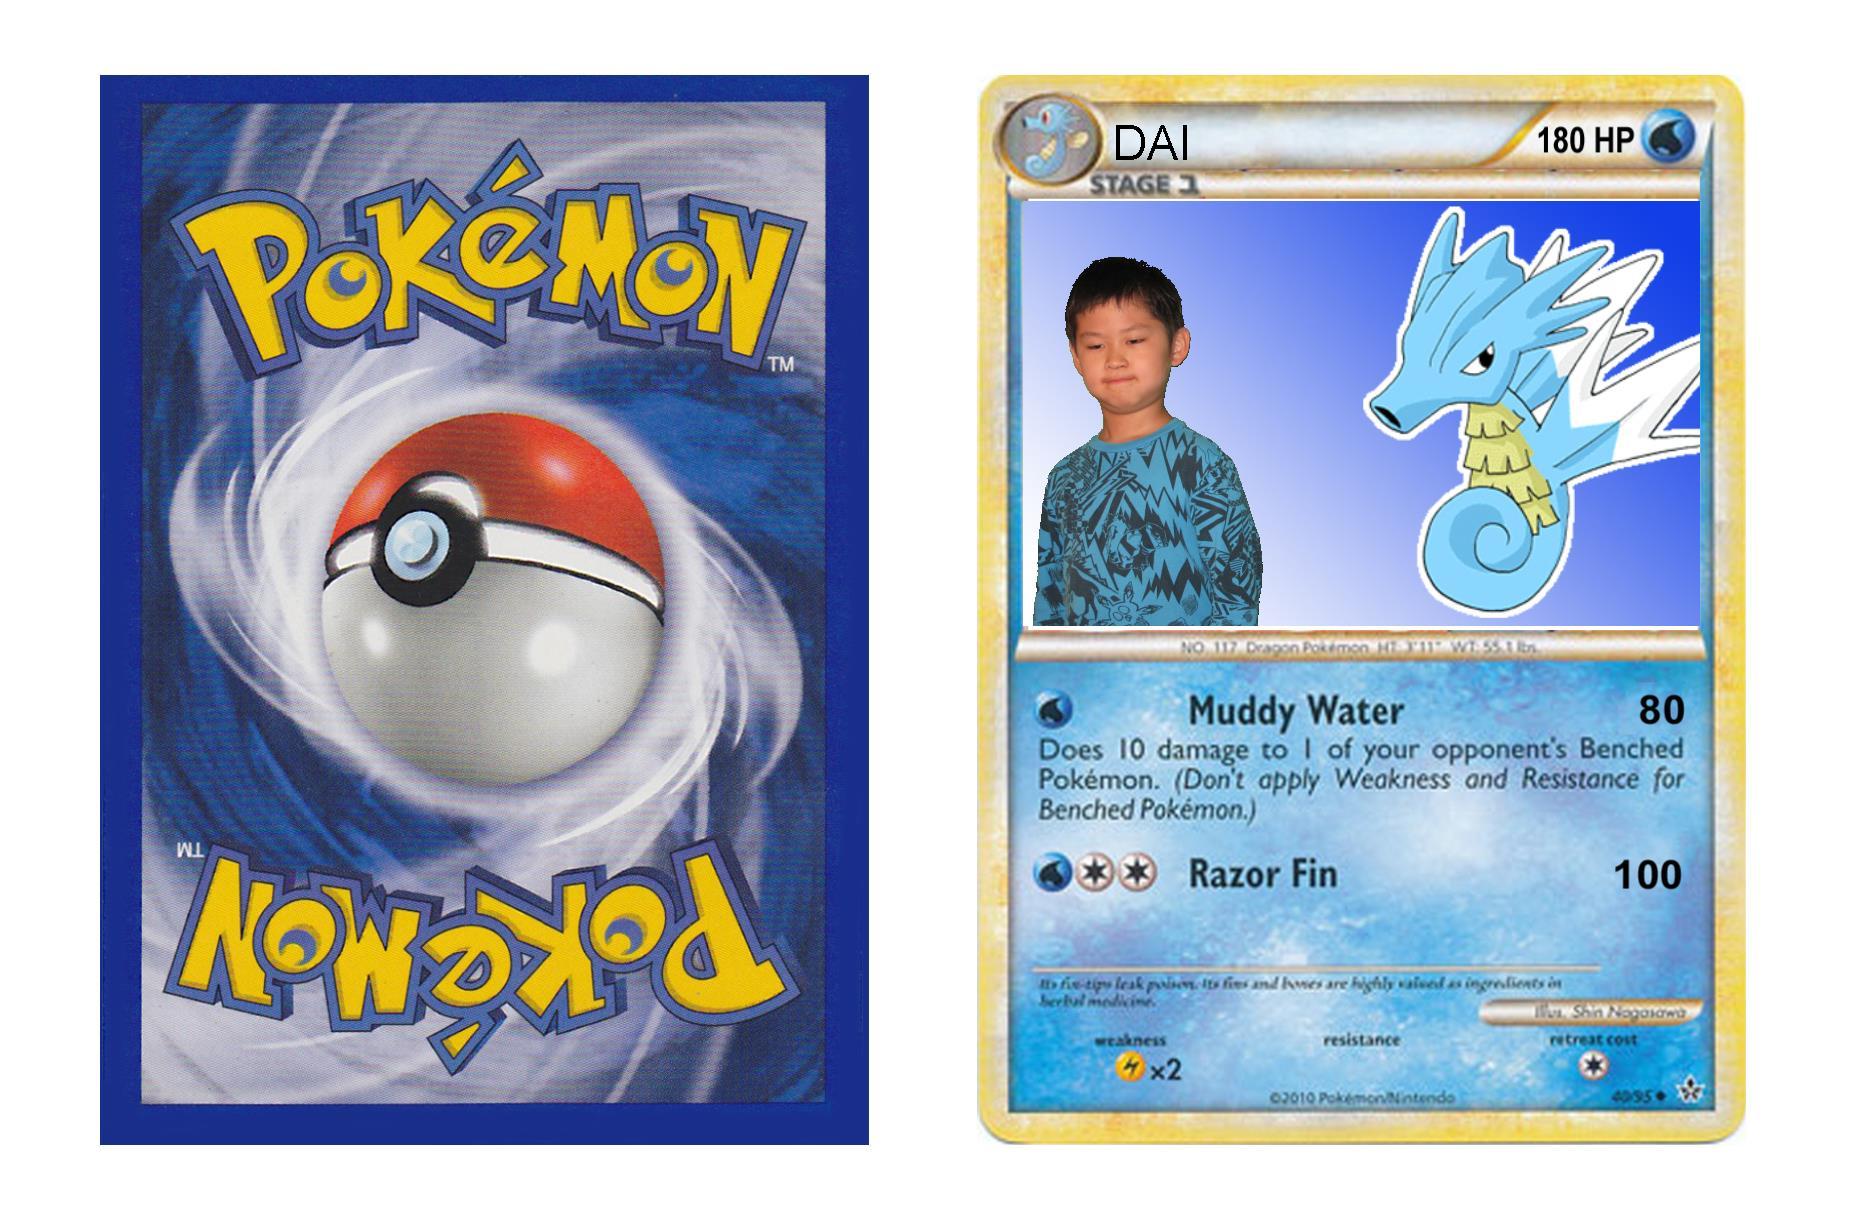 trading cards  start war  pokemon  sports novelty cards in